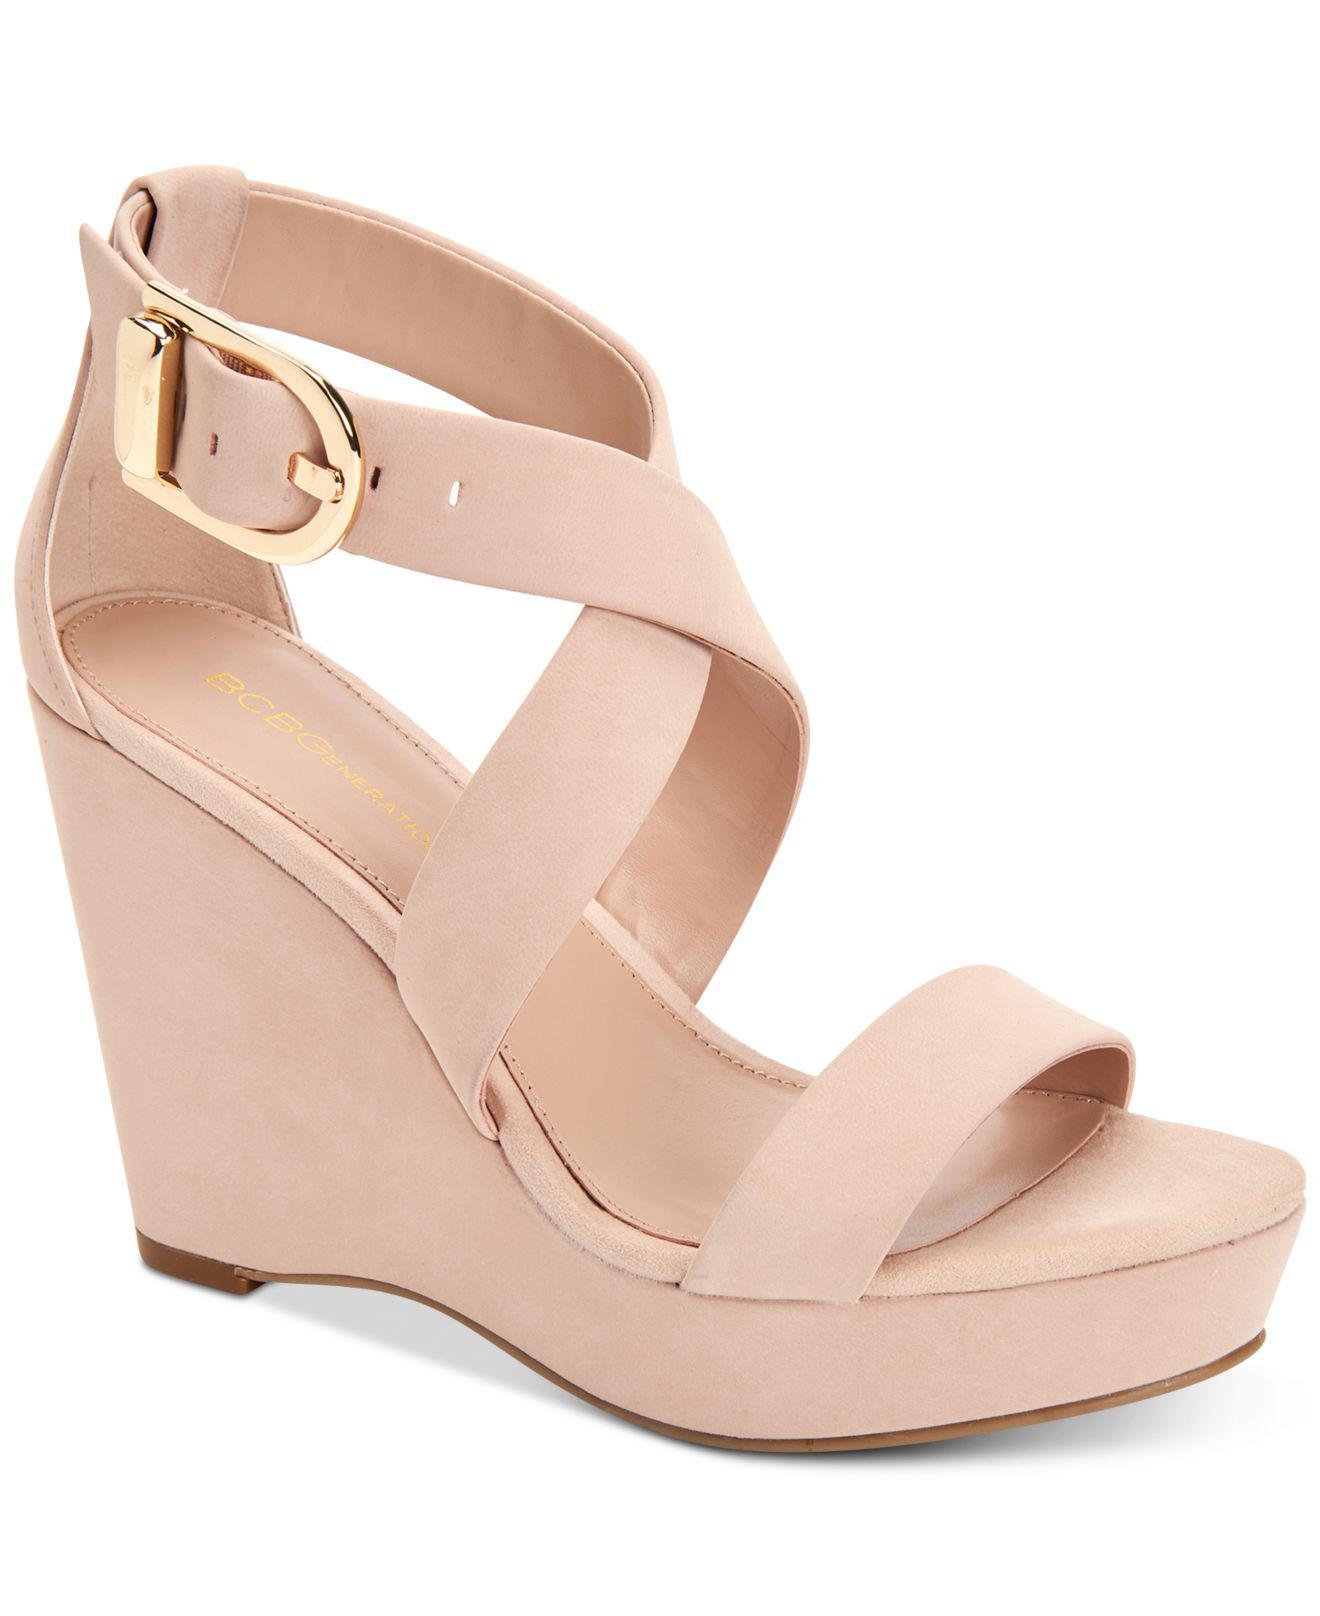 BCBGeneration Jae Platform Wedge Sandals Women's Shoes ioY9Z2UO